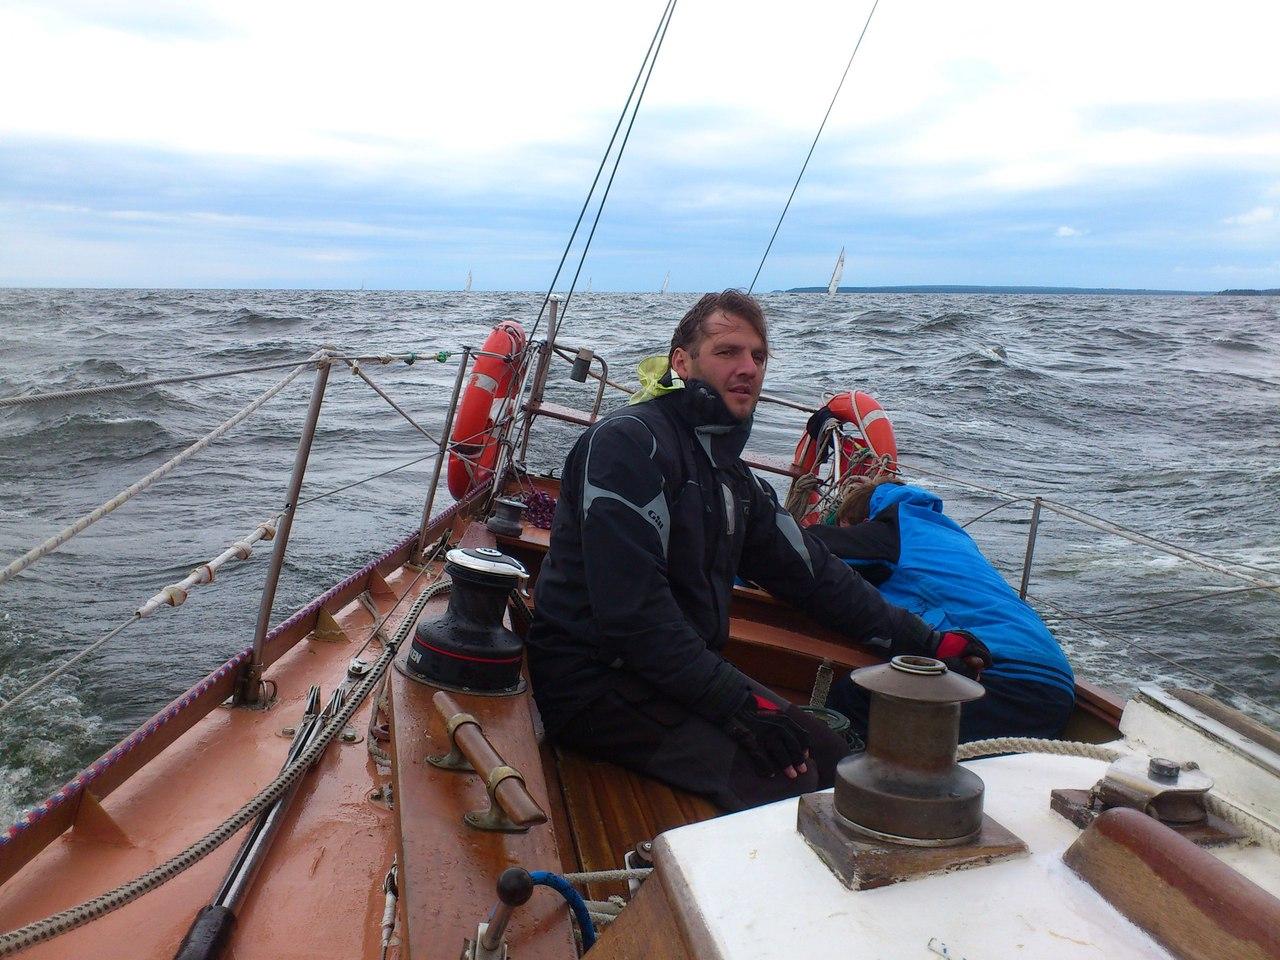 Фото экипажа яхты Варяг с разрешения Максима Церуняна